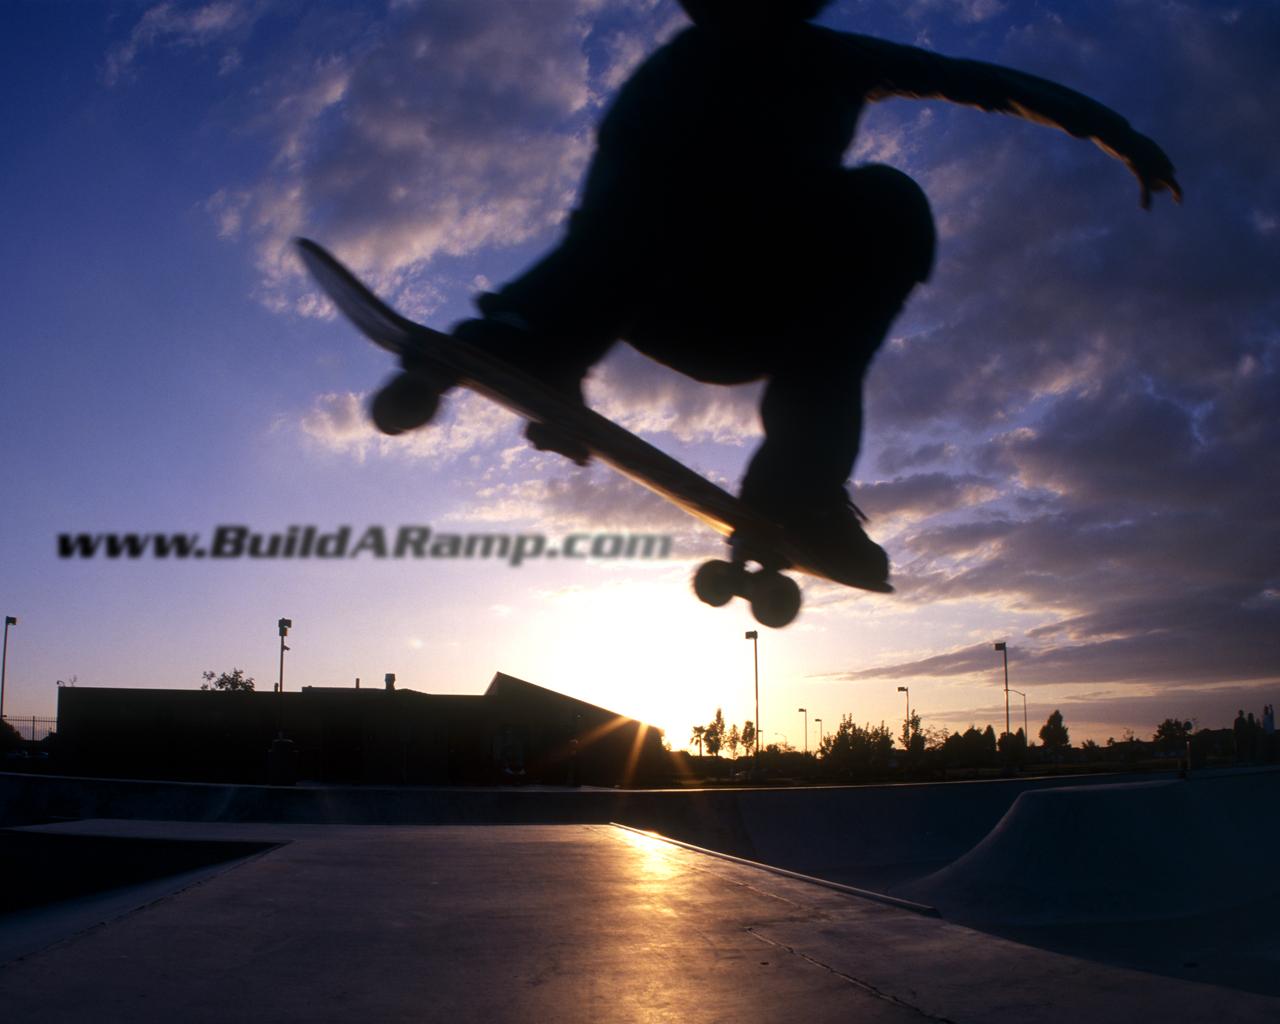 http://1.bp.blogspot.com/_EzMFAVTHXg8/TSk8KixkFzI/AAAAAAAAAEI/6XnhM8lfjhQ/s1600/skateboard.jpg